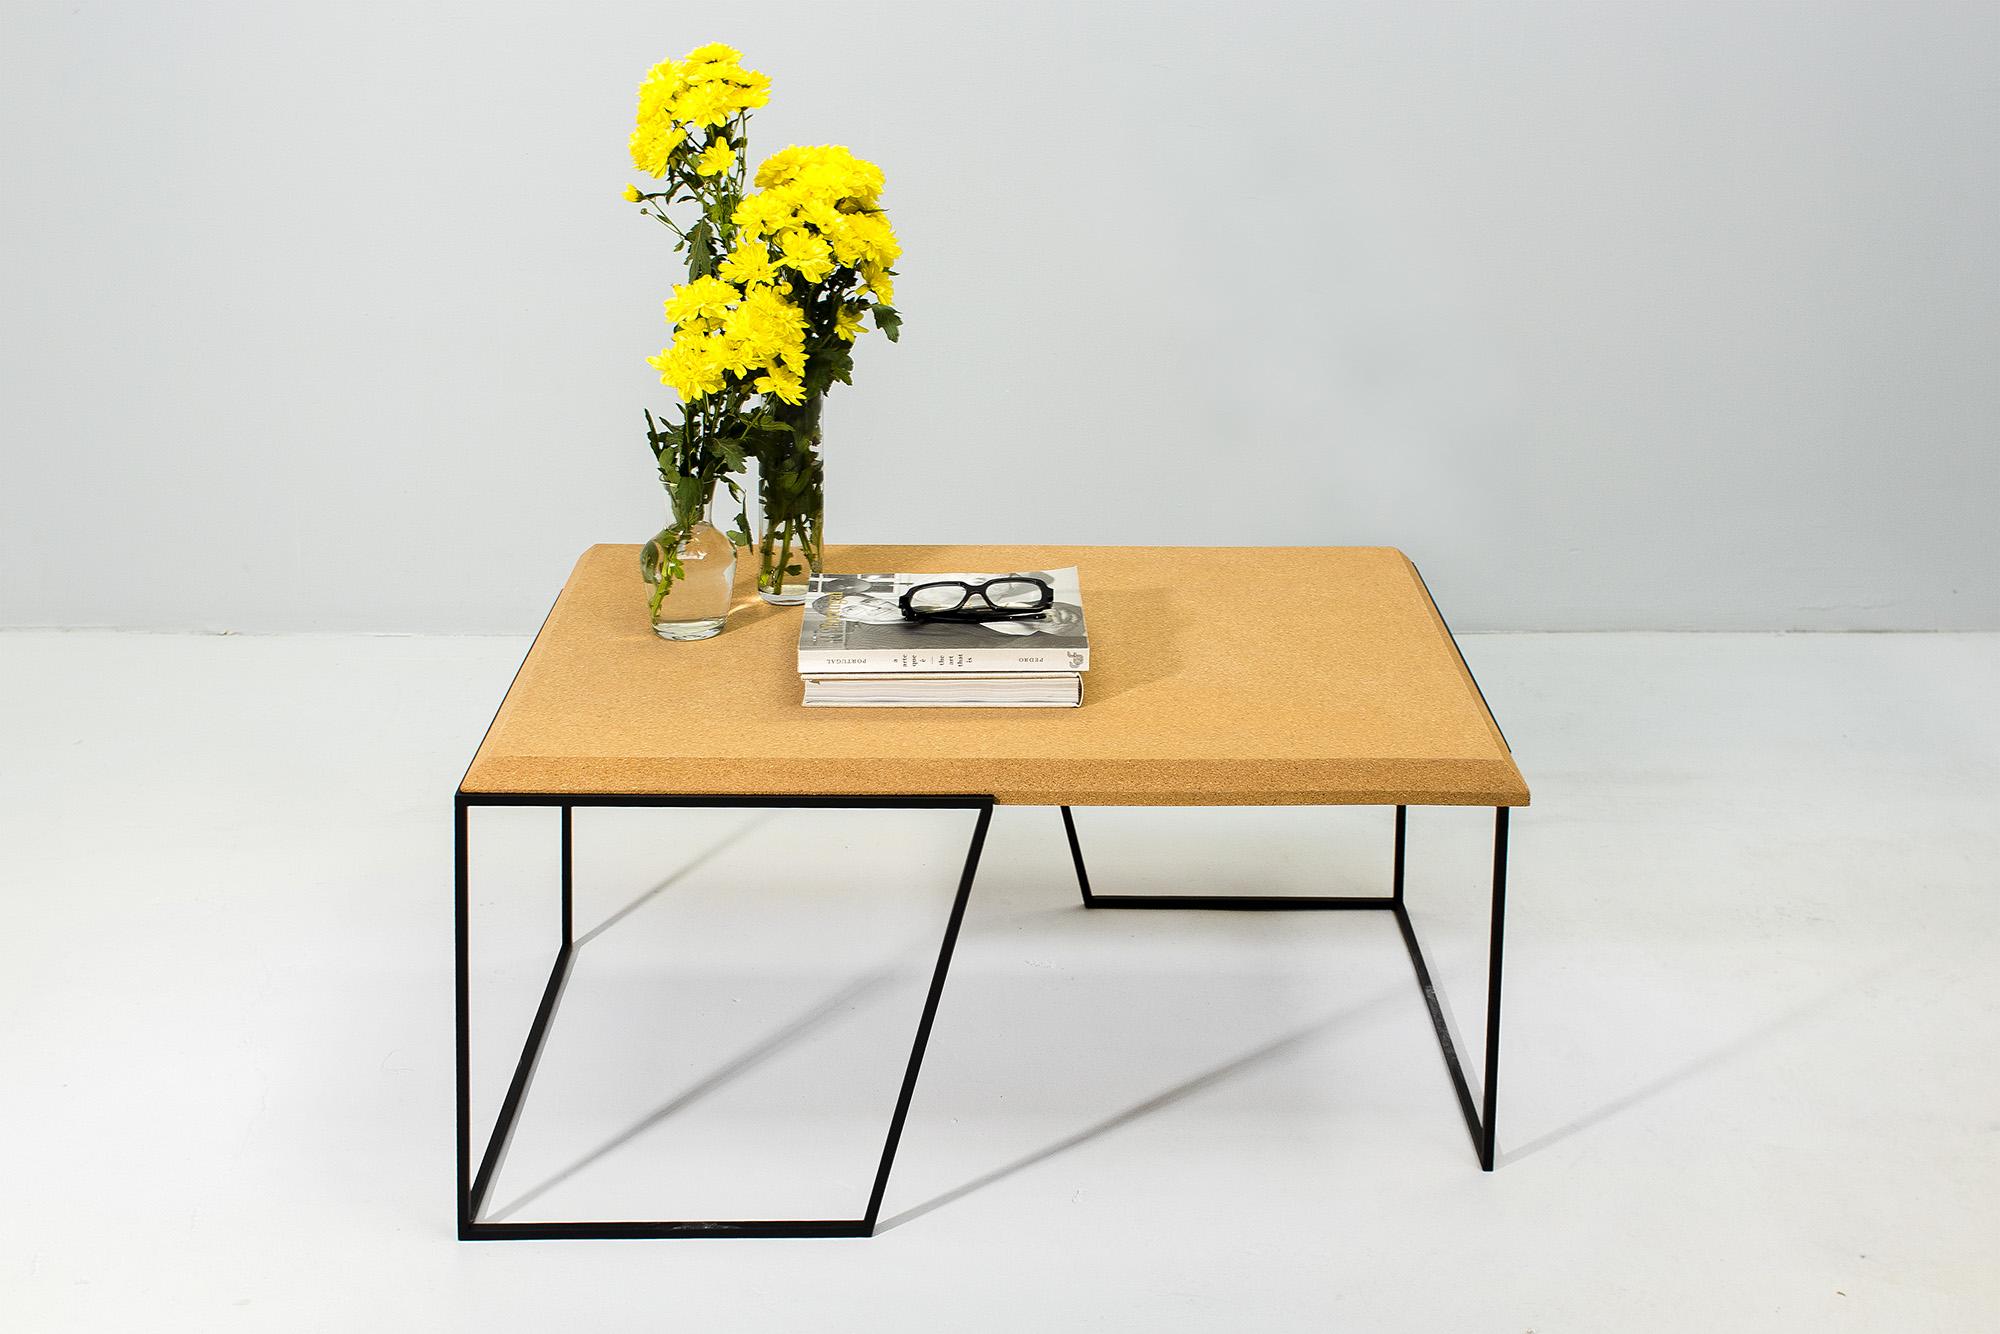 low-Galula-Grão-center-table-1-light-cork-black-03.jpg